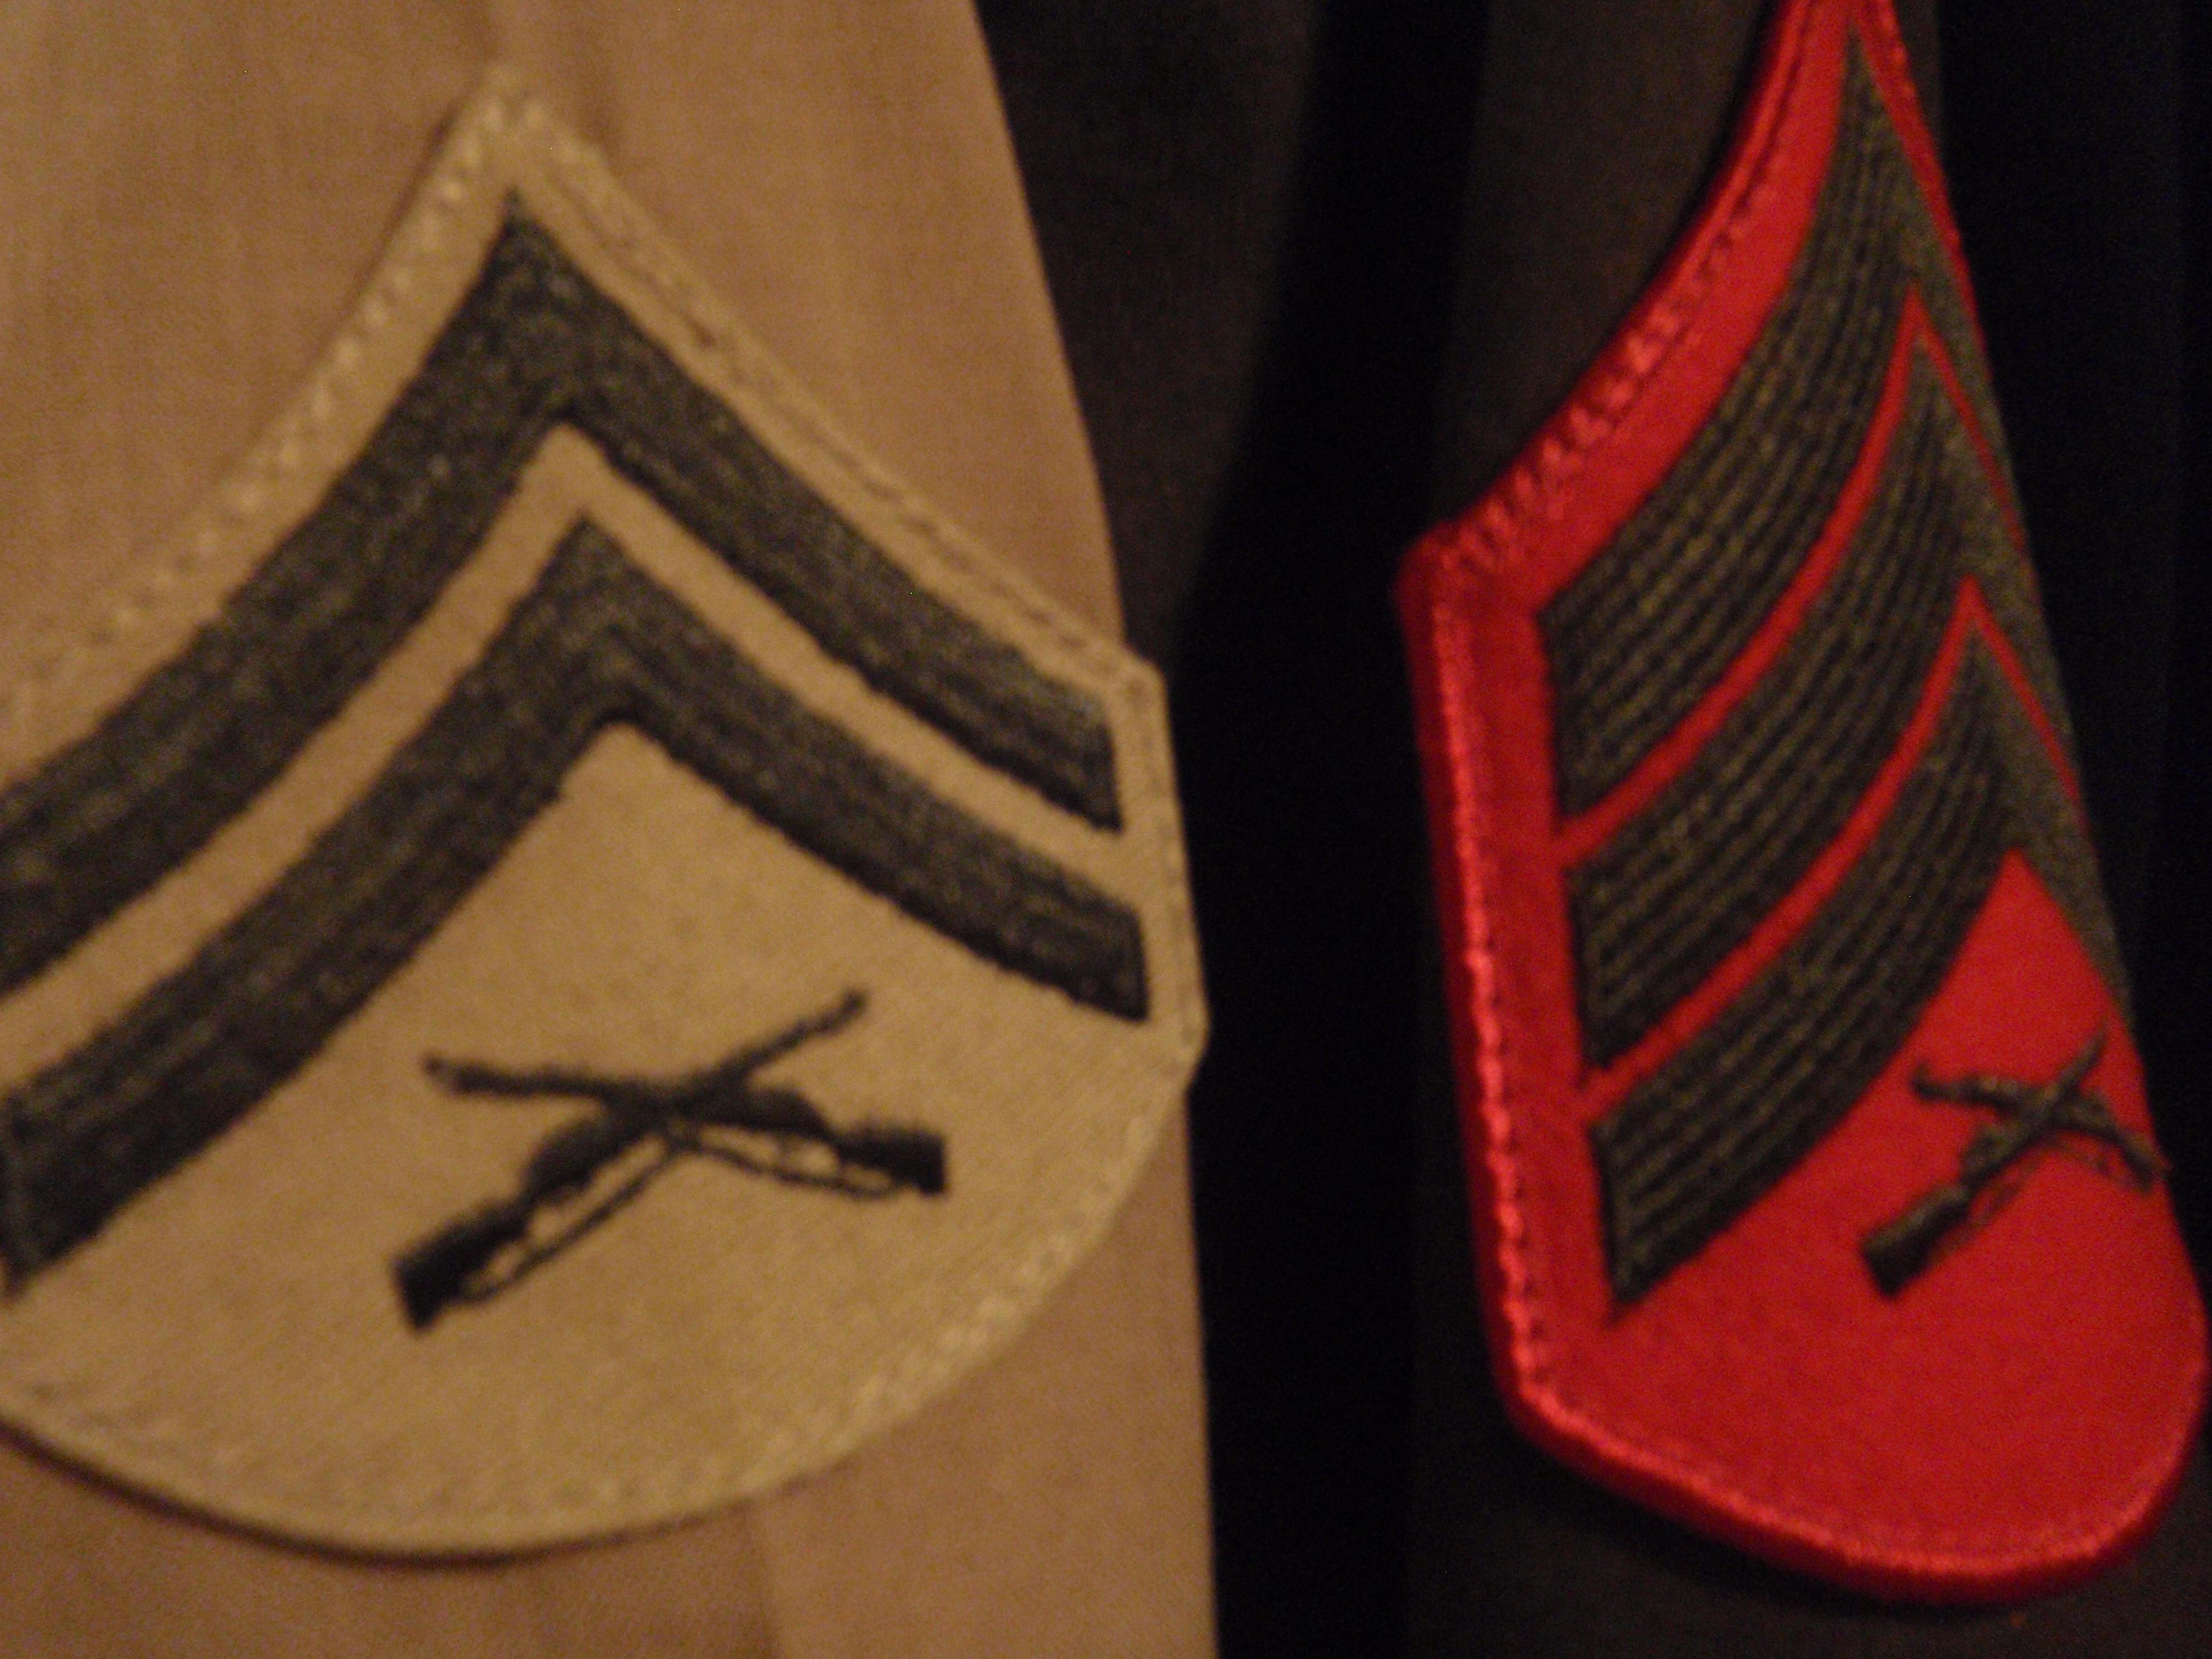 United States Marine Corps rank insignia